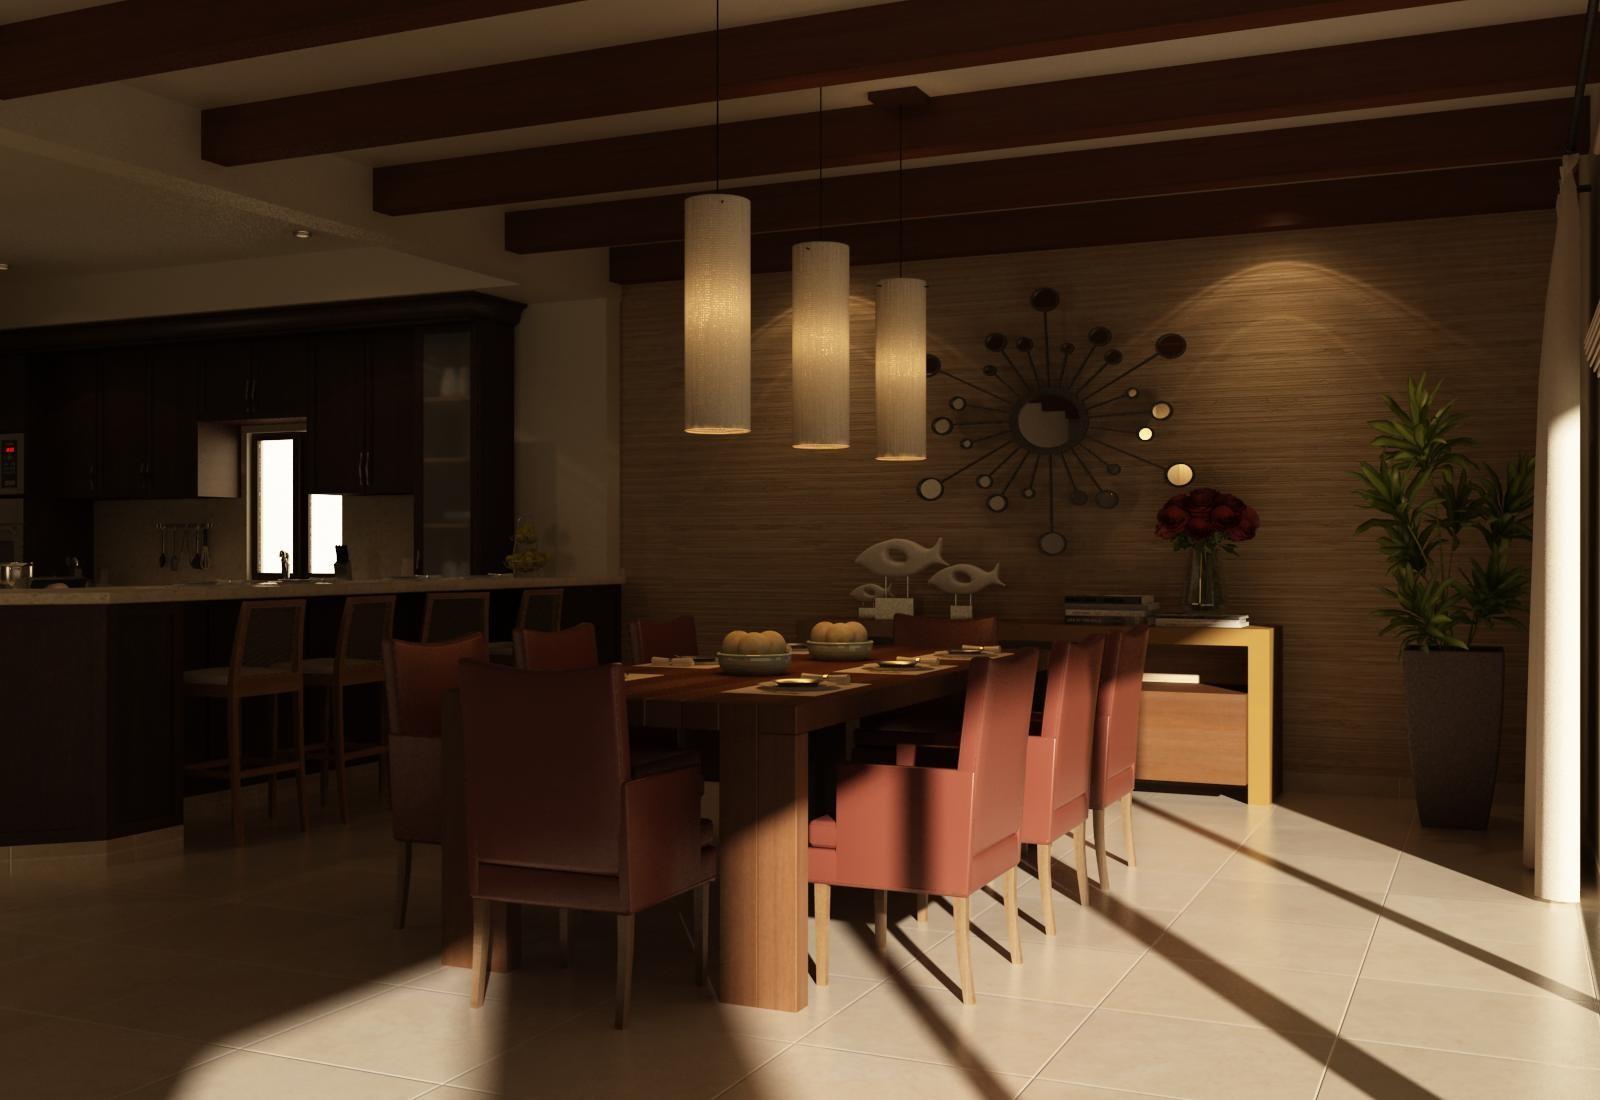 interior cocina-comedor